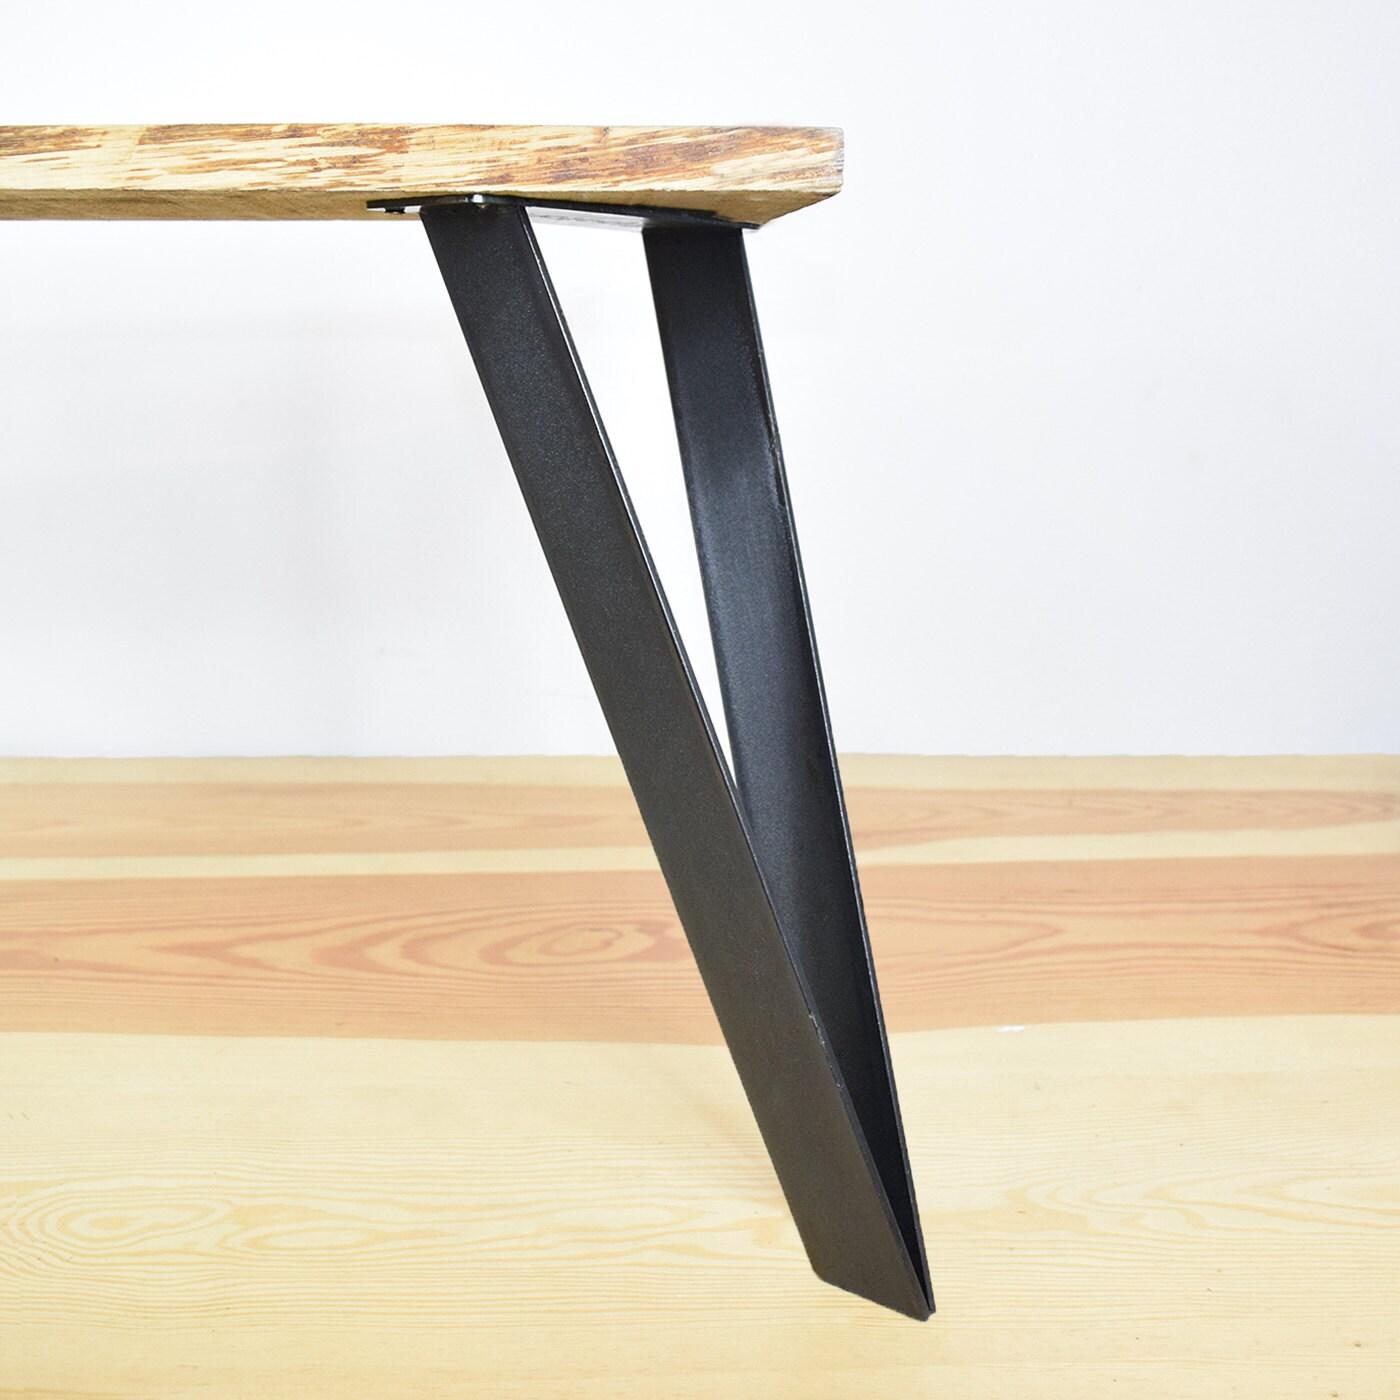 pied de table cavalier en acier plat 40 cm. Black Bedroom Furniture Sets. Home Design Ideas